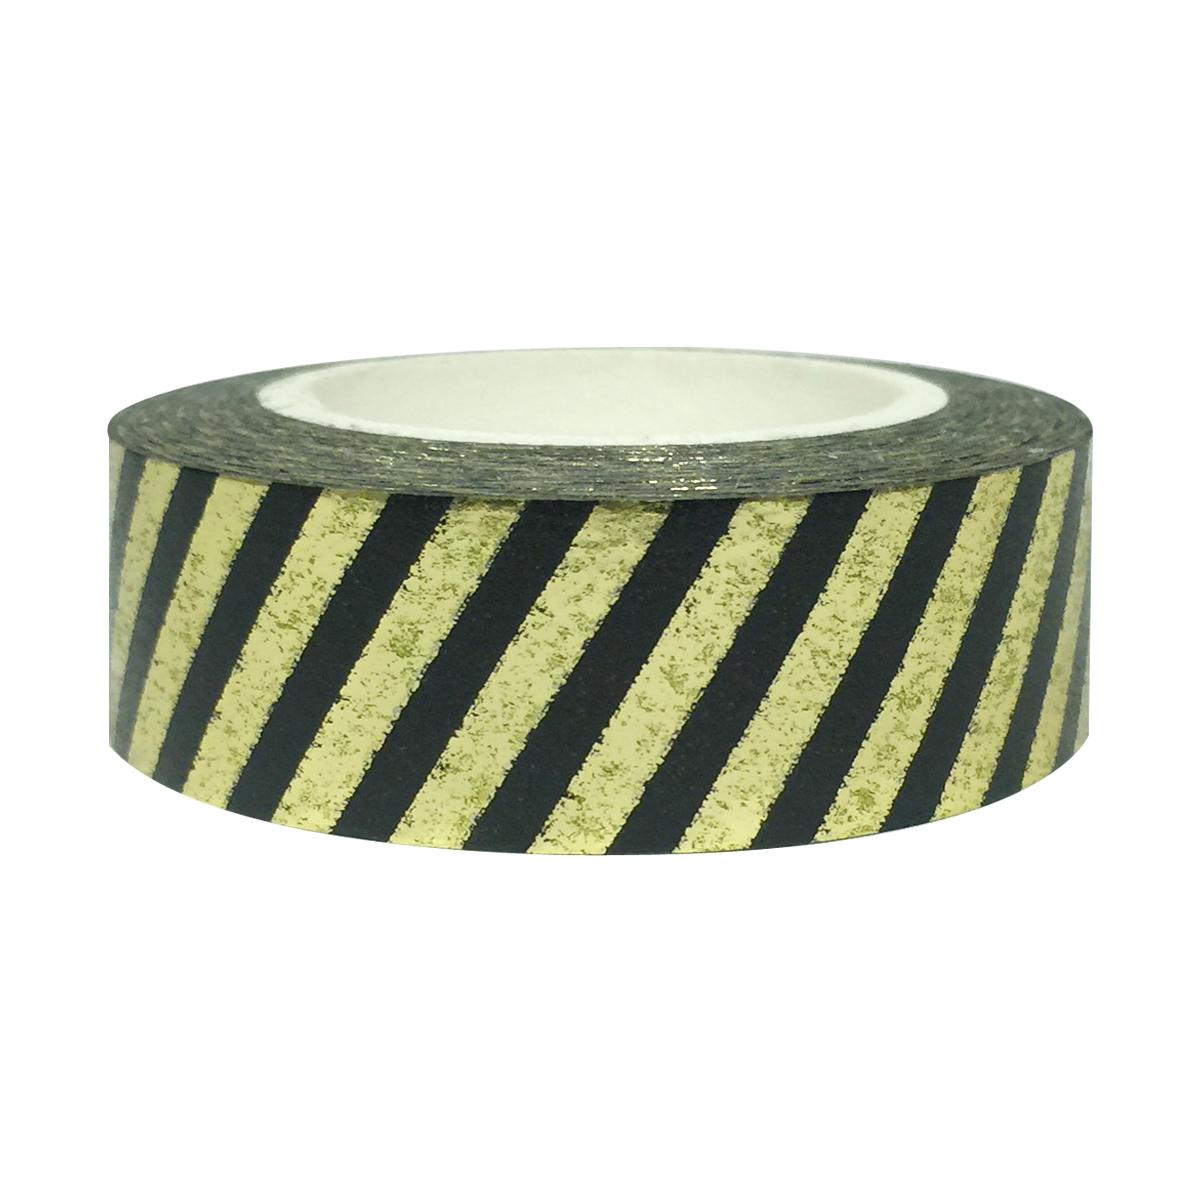 Wrapables® Colorful Washi Masking Tape, Black and Metallic Gold Stripes